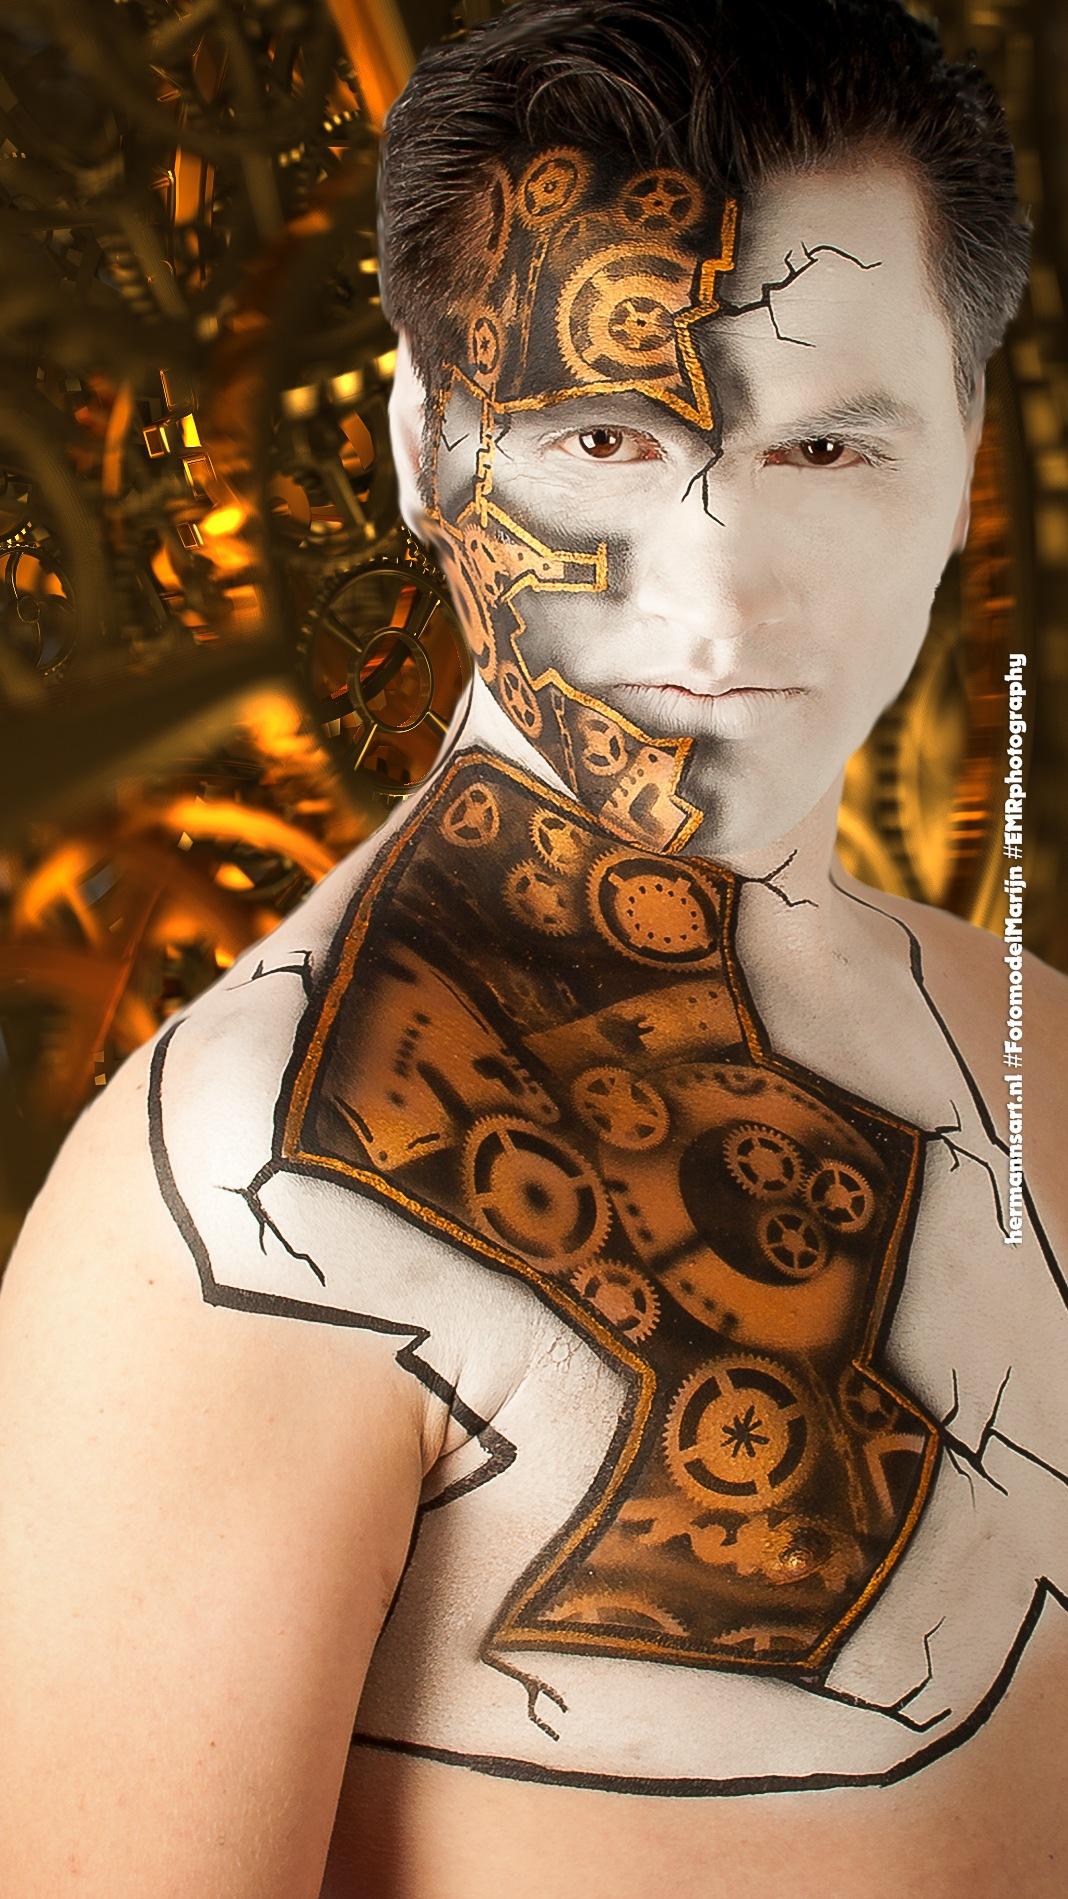 My art by EMR Photography & Fotomodel Marijn